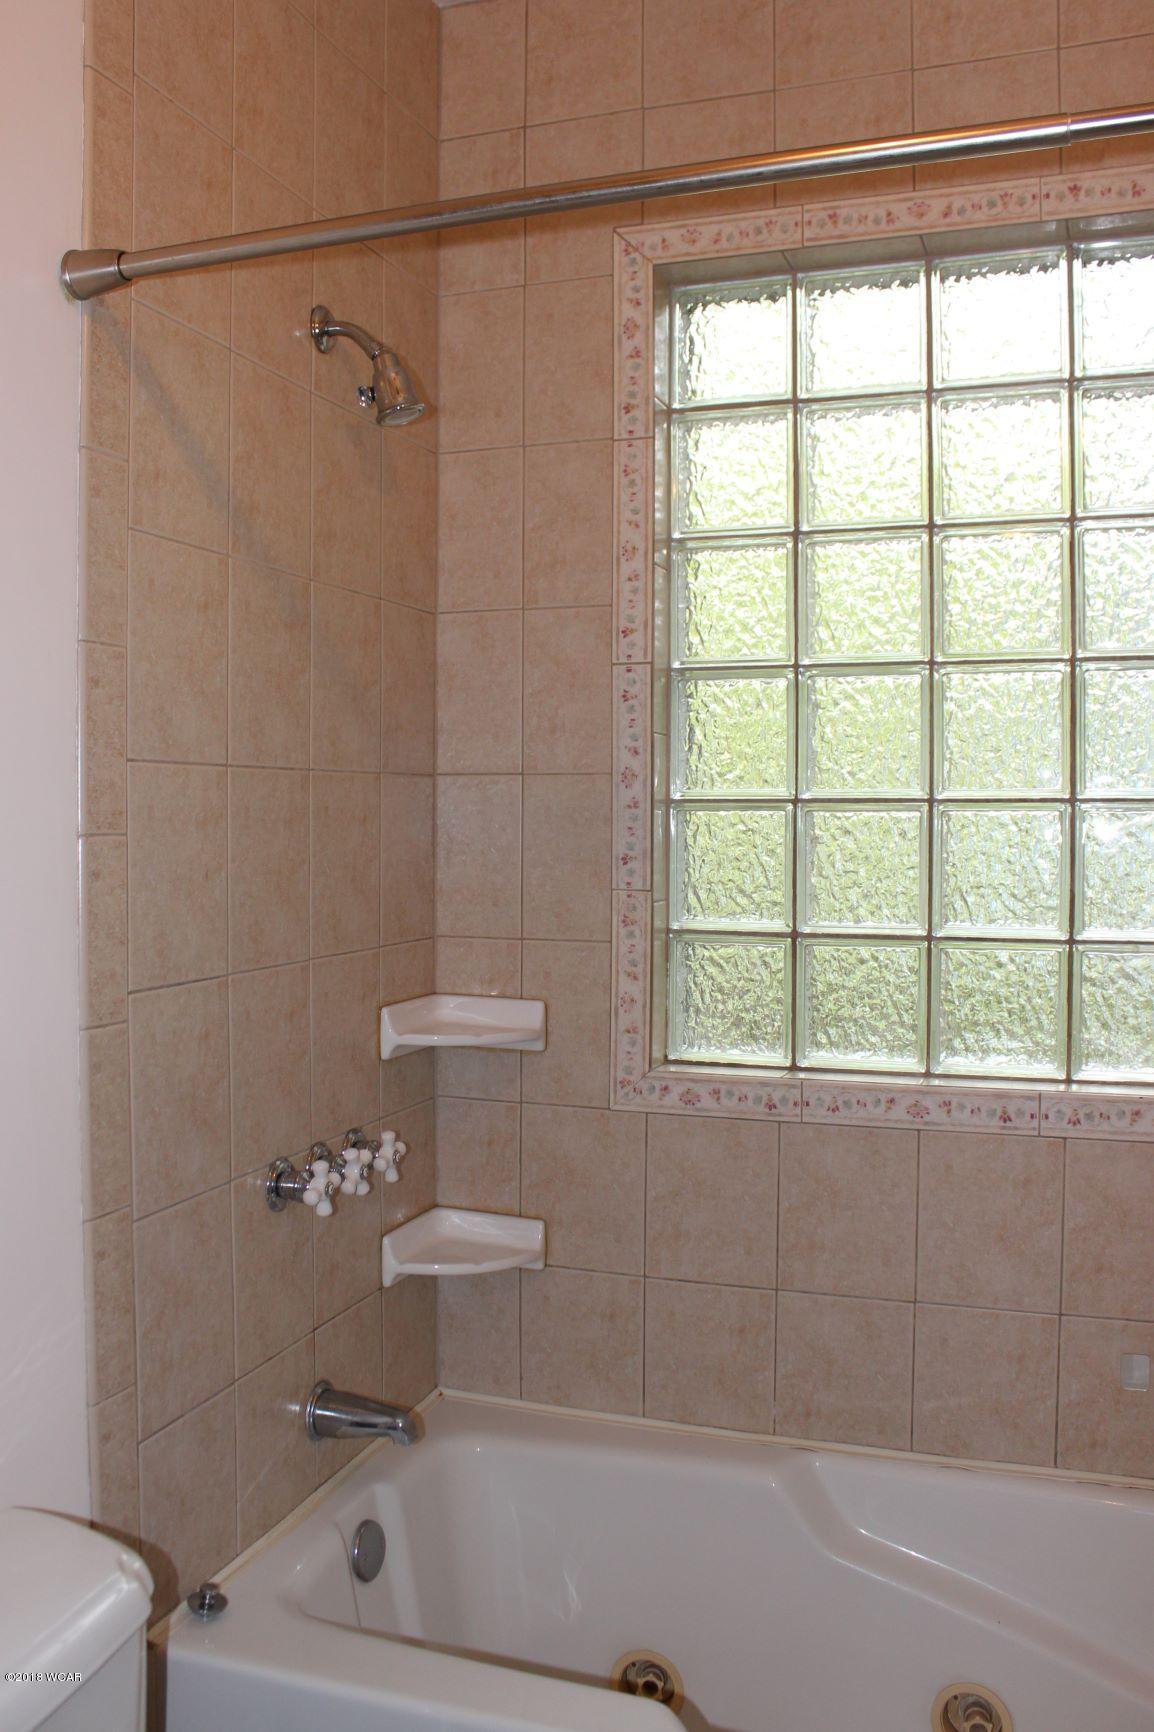 627 7th Street,Willmar,4 Bedrooms Bedrooms,2 BathroomsBathrooms,Single Family,7th Street,6032435